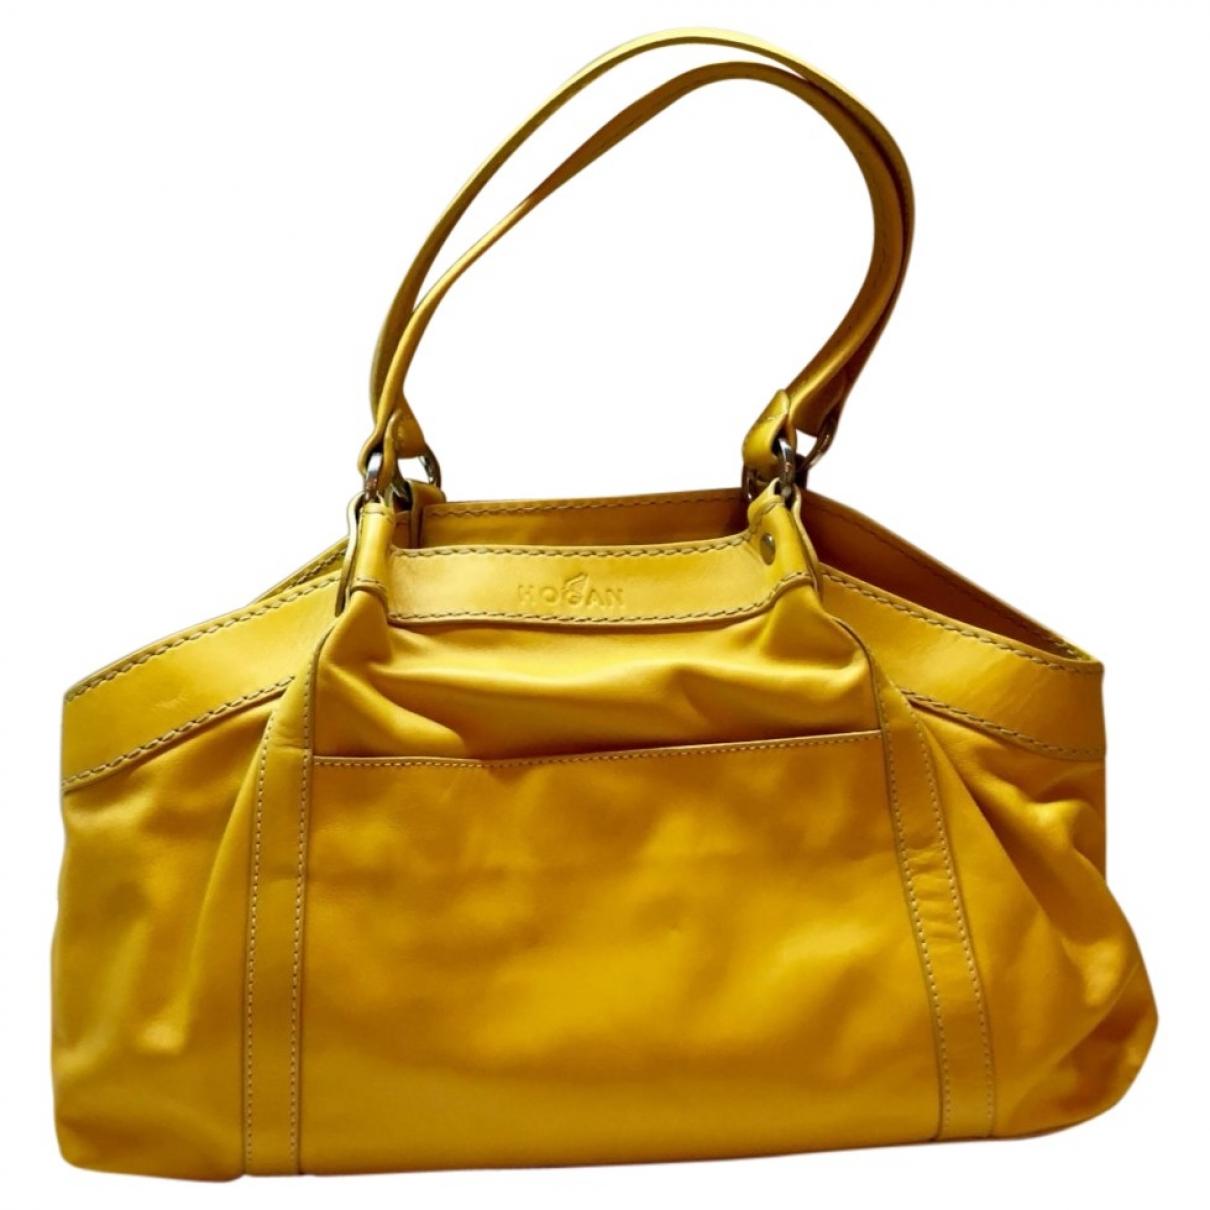 Hogan - Sac a main   pour femme en cuir - jaune